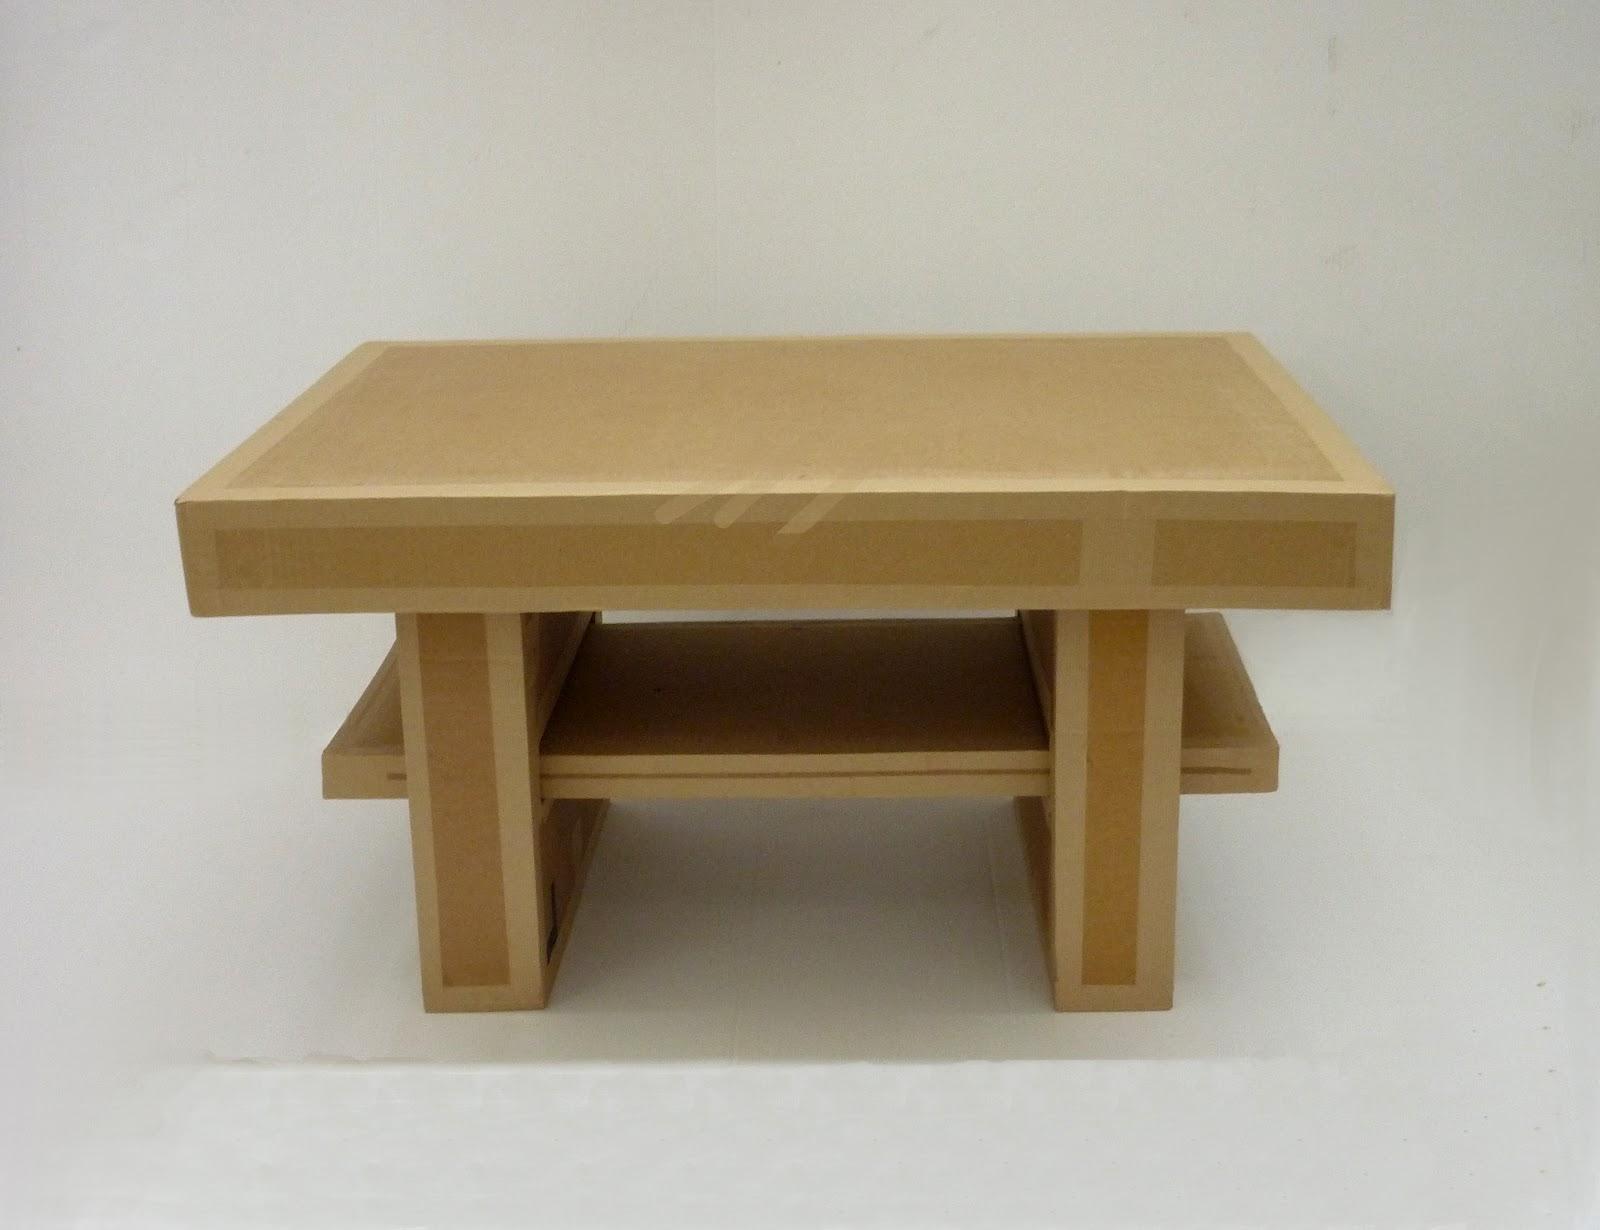 carton et compagnie table basse rubix. Black Bedroom Furniture Sets. Home Design Ideas